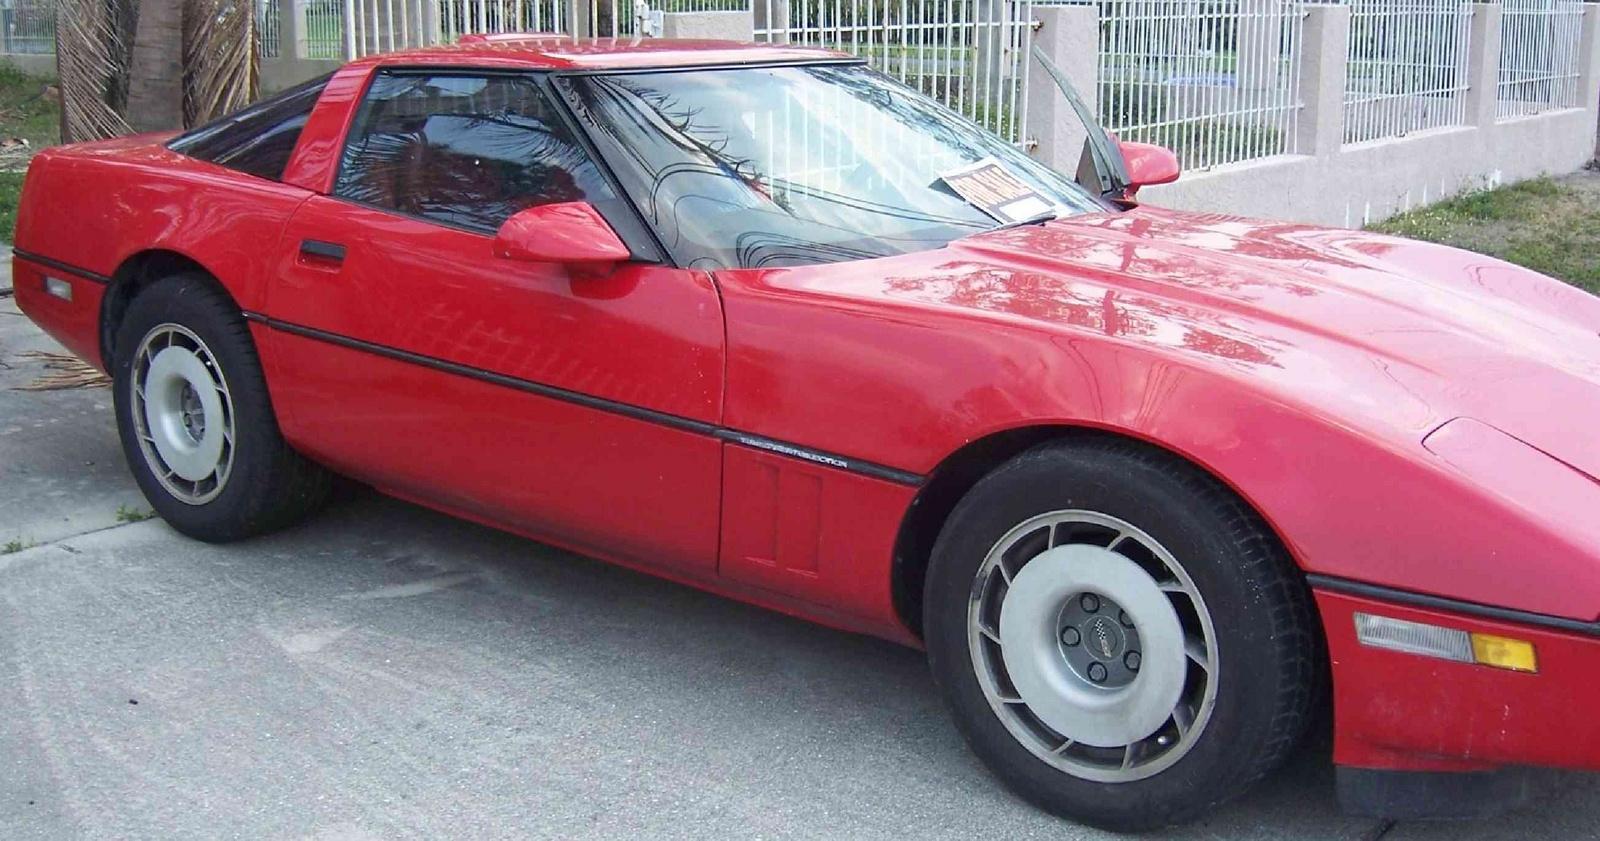 used chevrolet corvette for sale texas cargurus. Black Bedroom Furniture Sets. Home Design Ideas